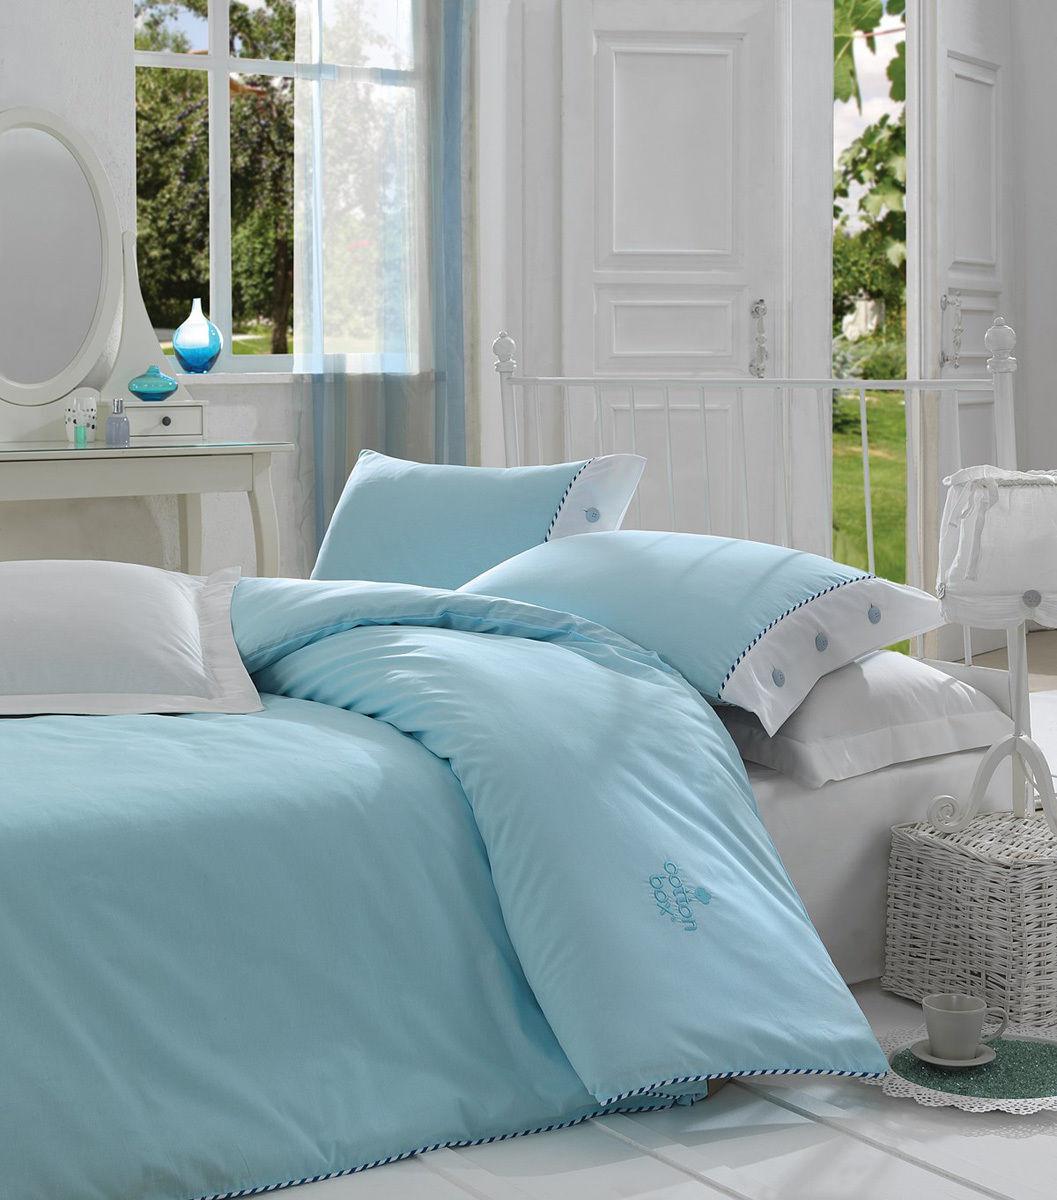 Blau Turquoise 100% Breathable Cotton Fabric Duvet Cover Bedding Set Reversible